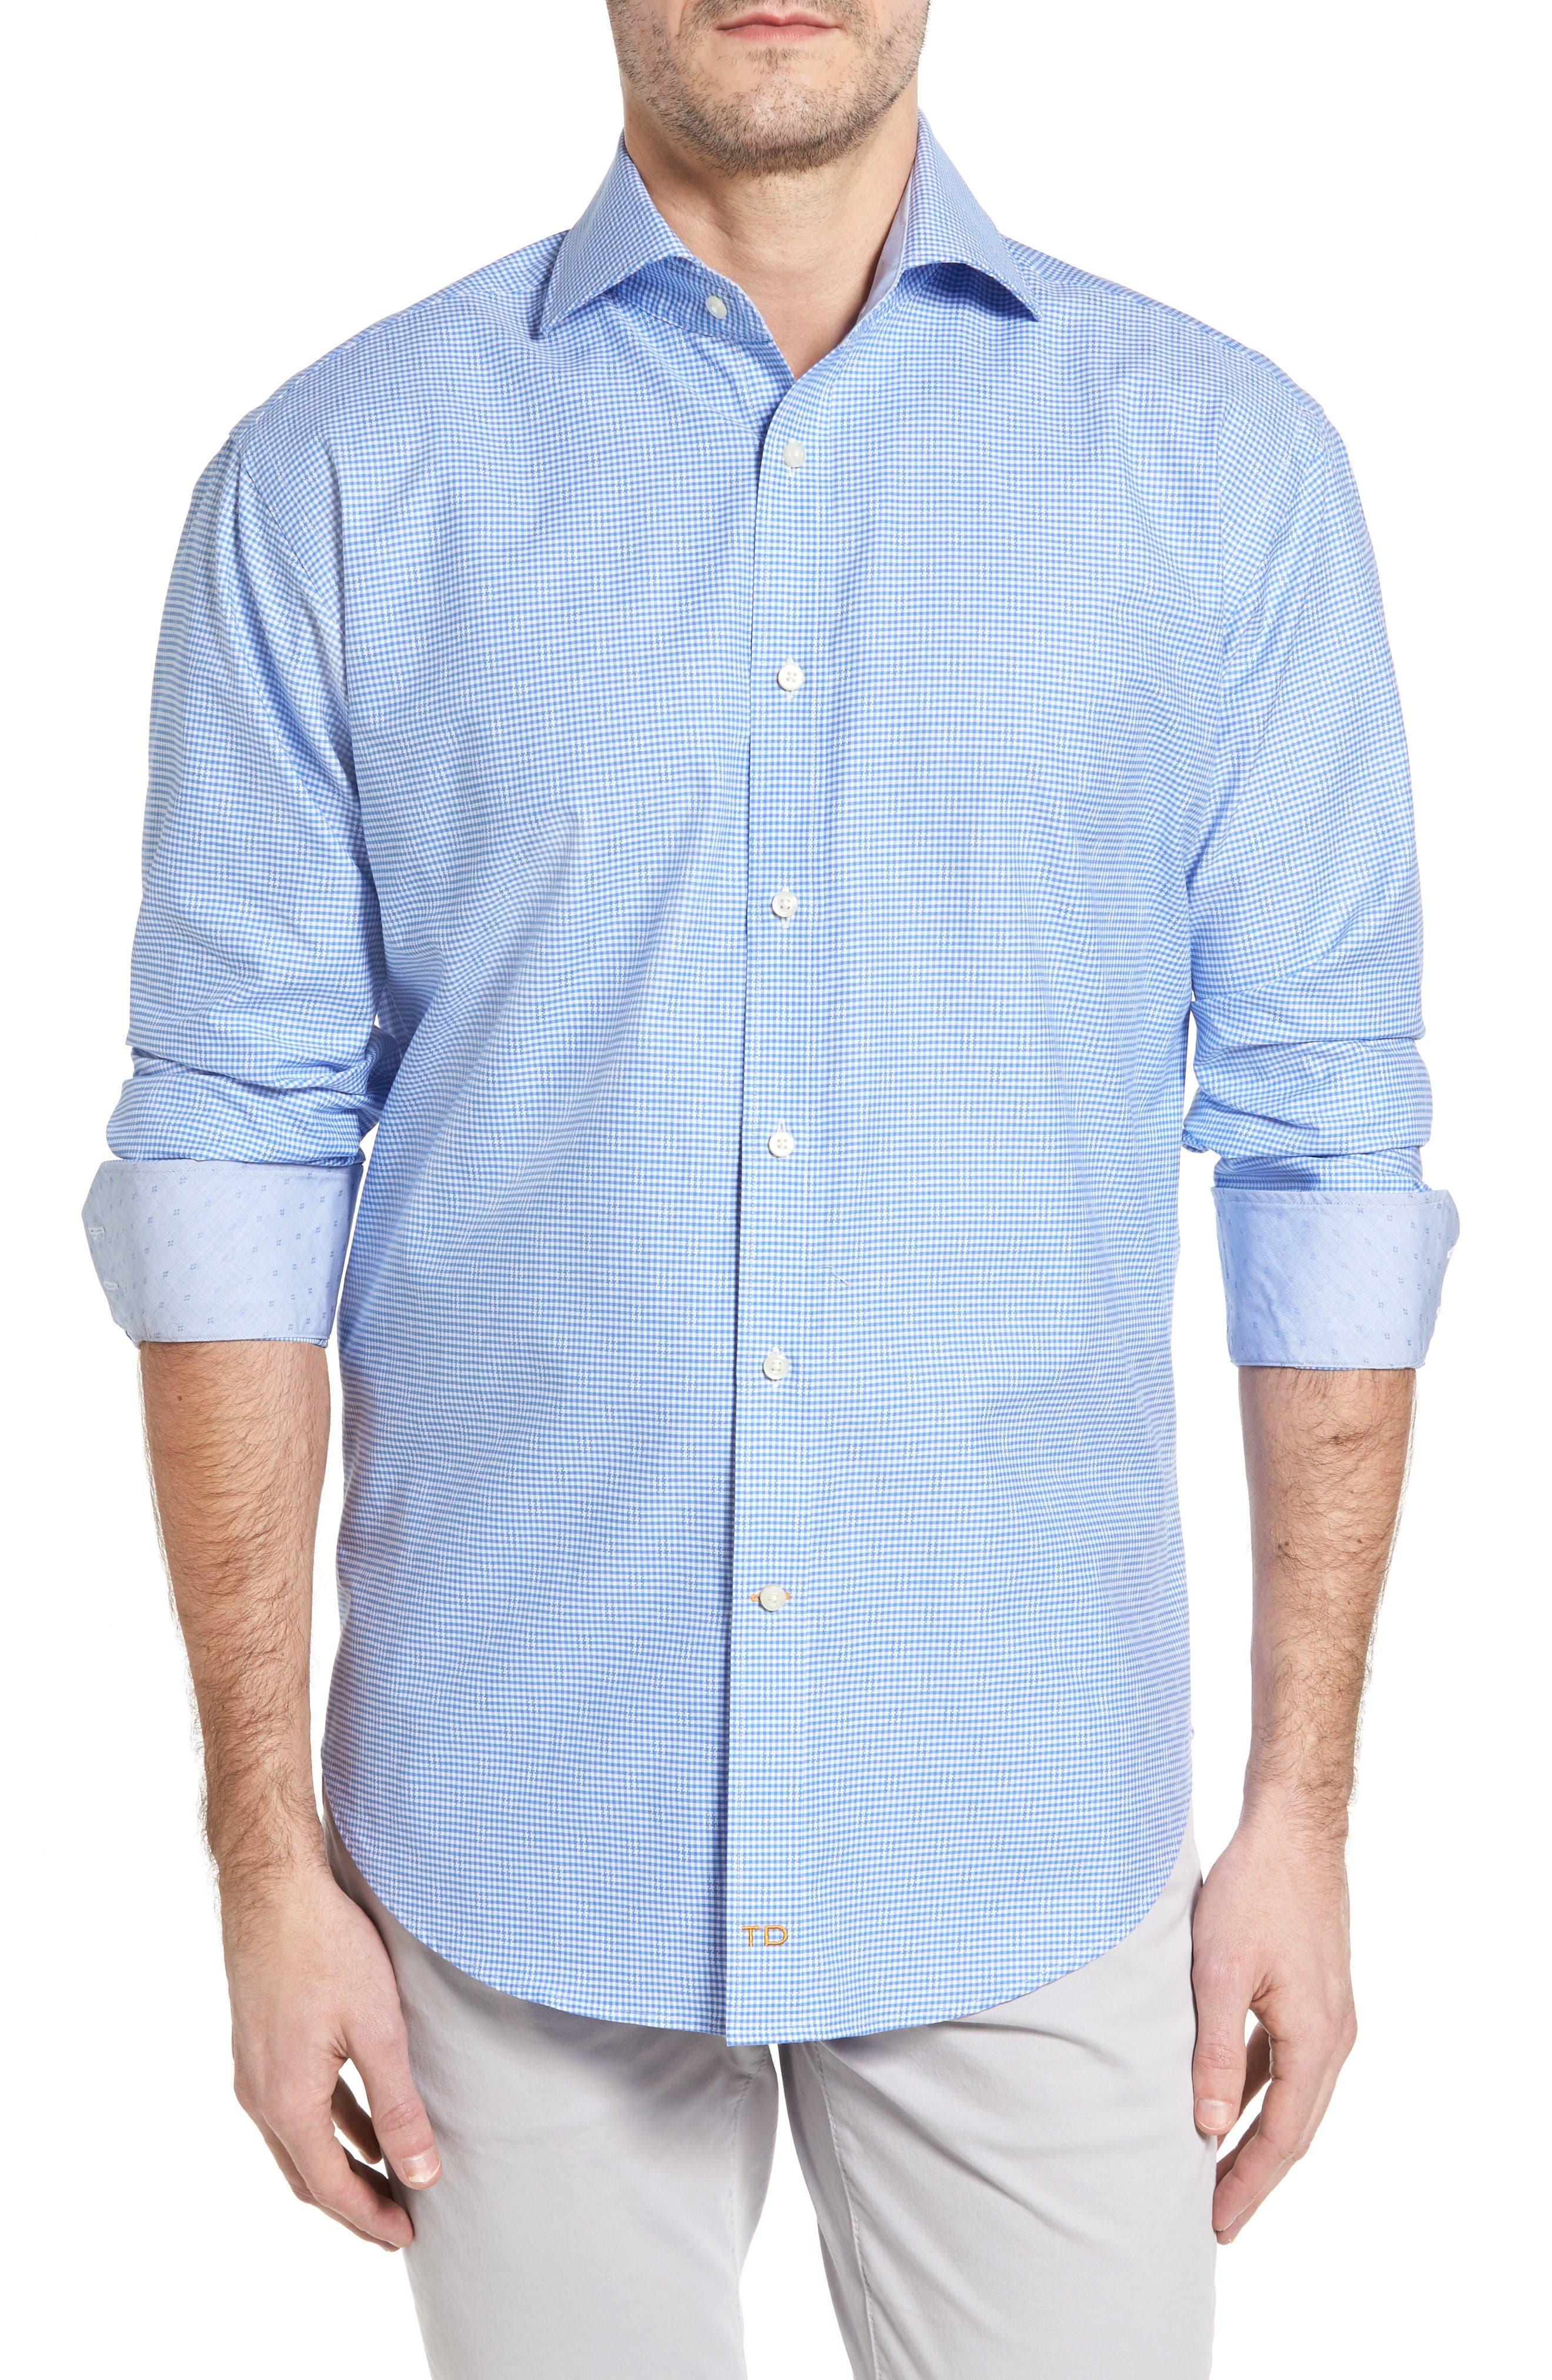 Main Image - Thomas Dean Classic Fit Mini Check Sport Shirt (Regular)